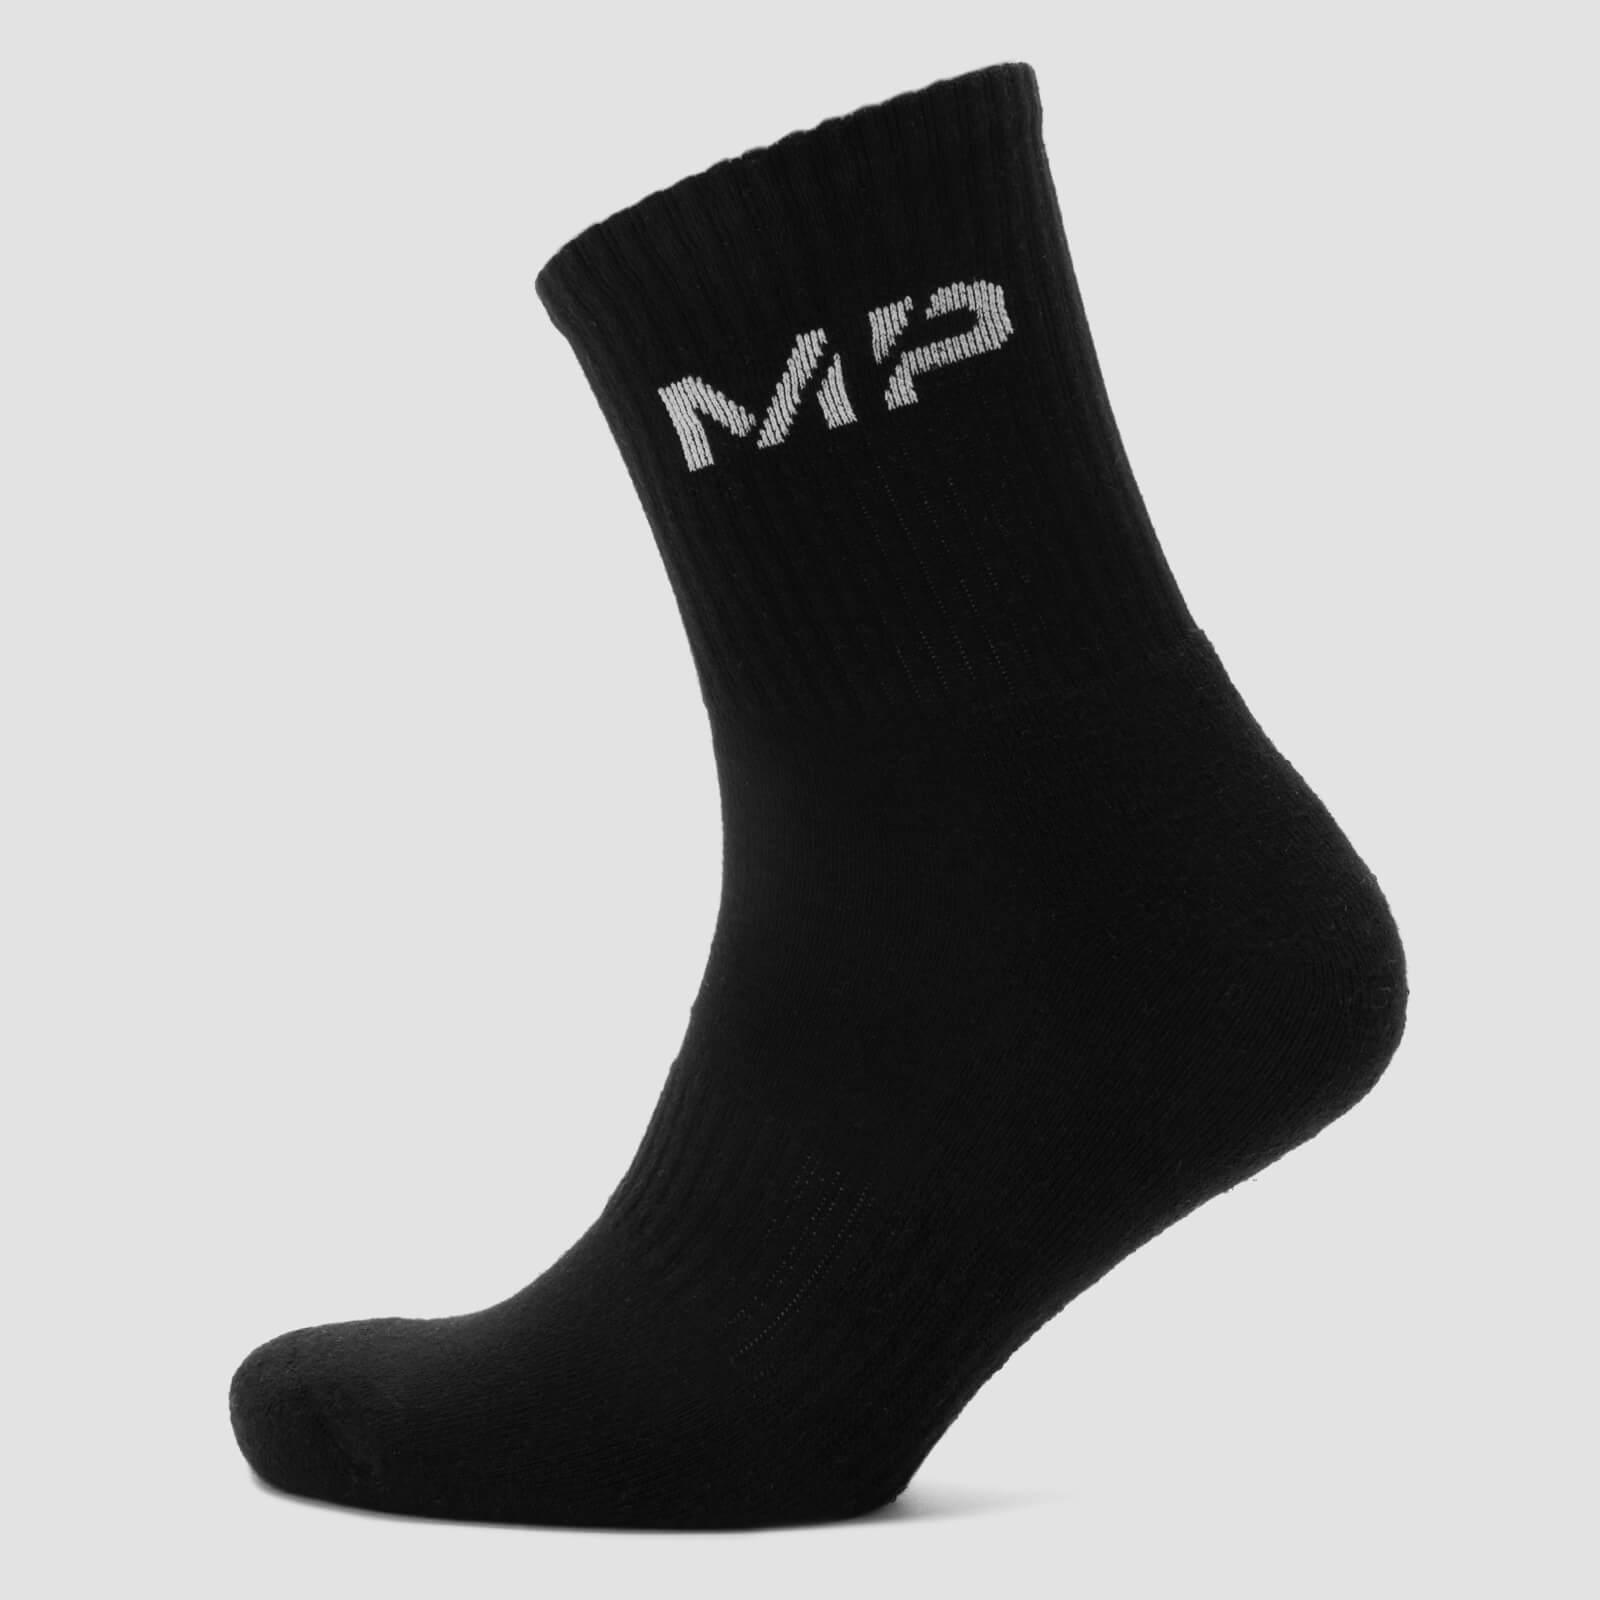 Myprotein MP Men's Core Crew Socks (2 Pack) - Black - UK 9-12